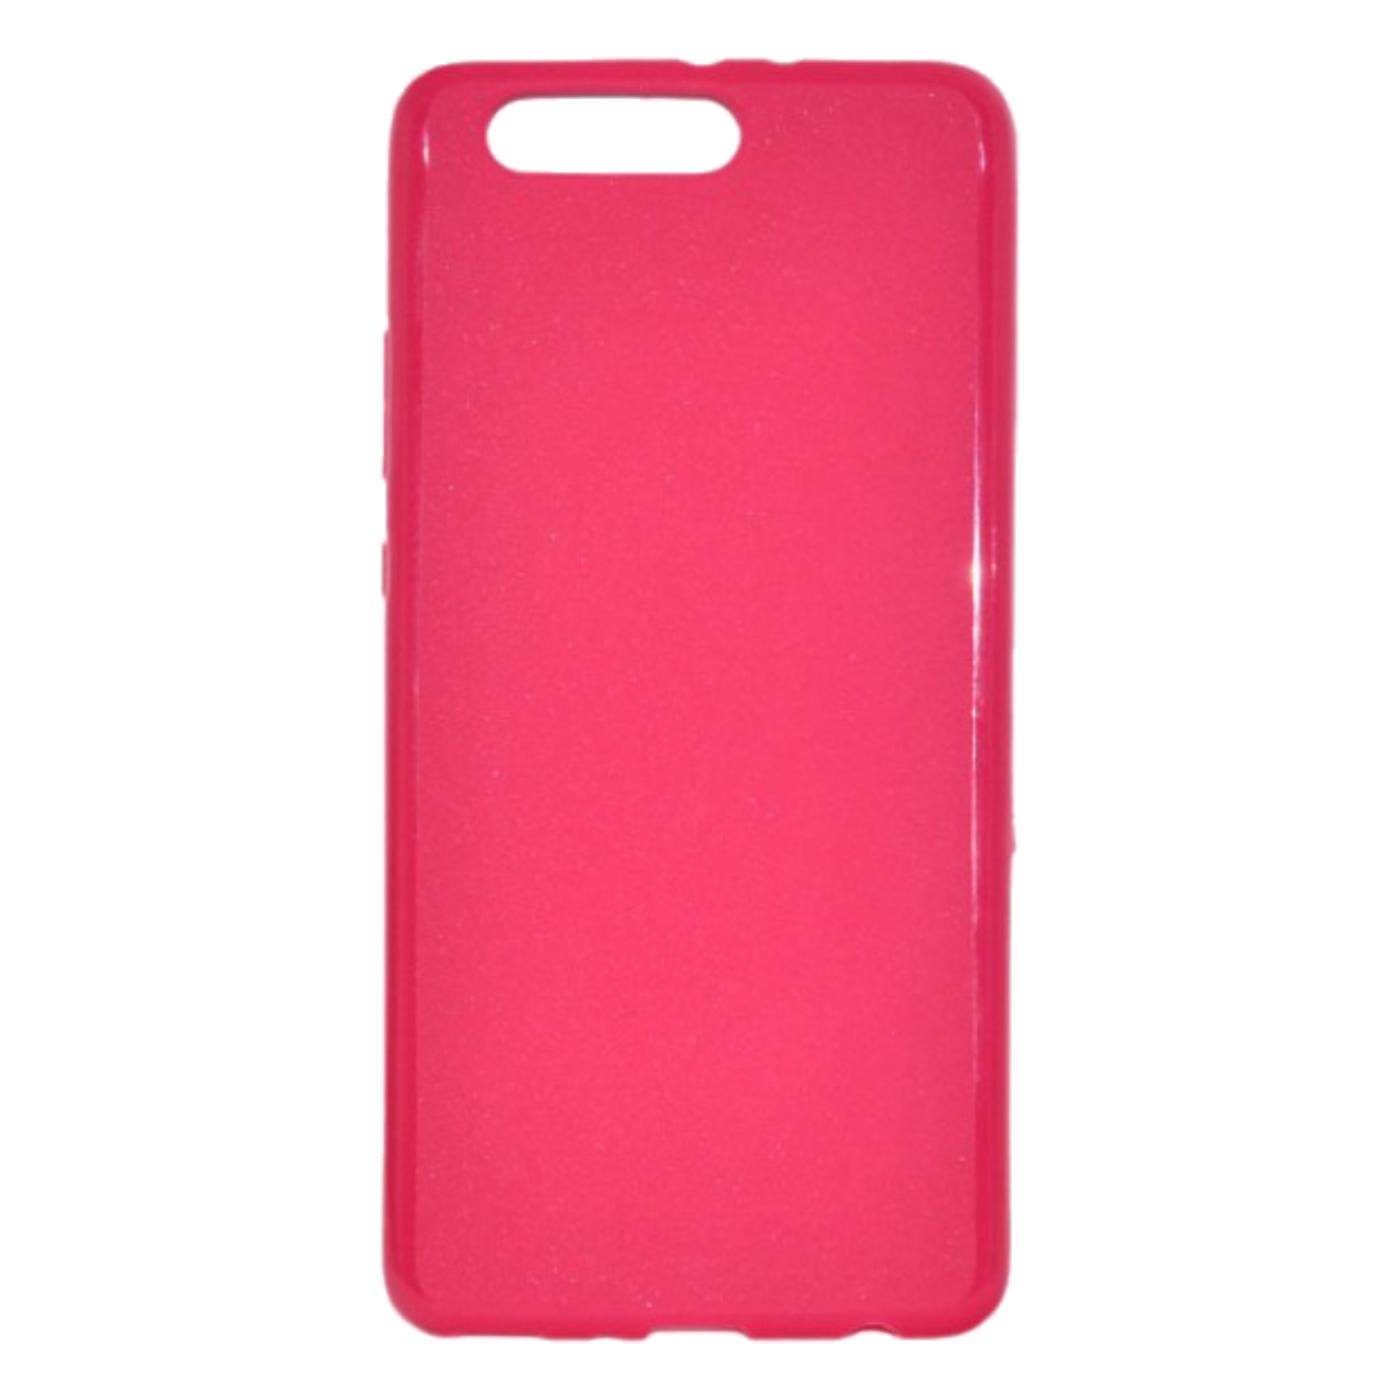 Futrola za mobitel Huawei P10 Lite, silikonska, pink